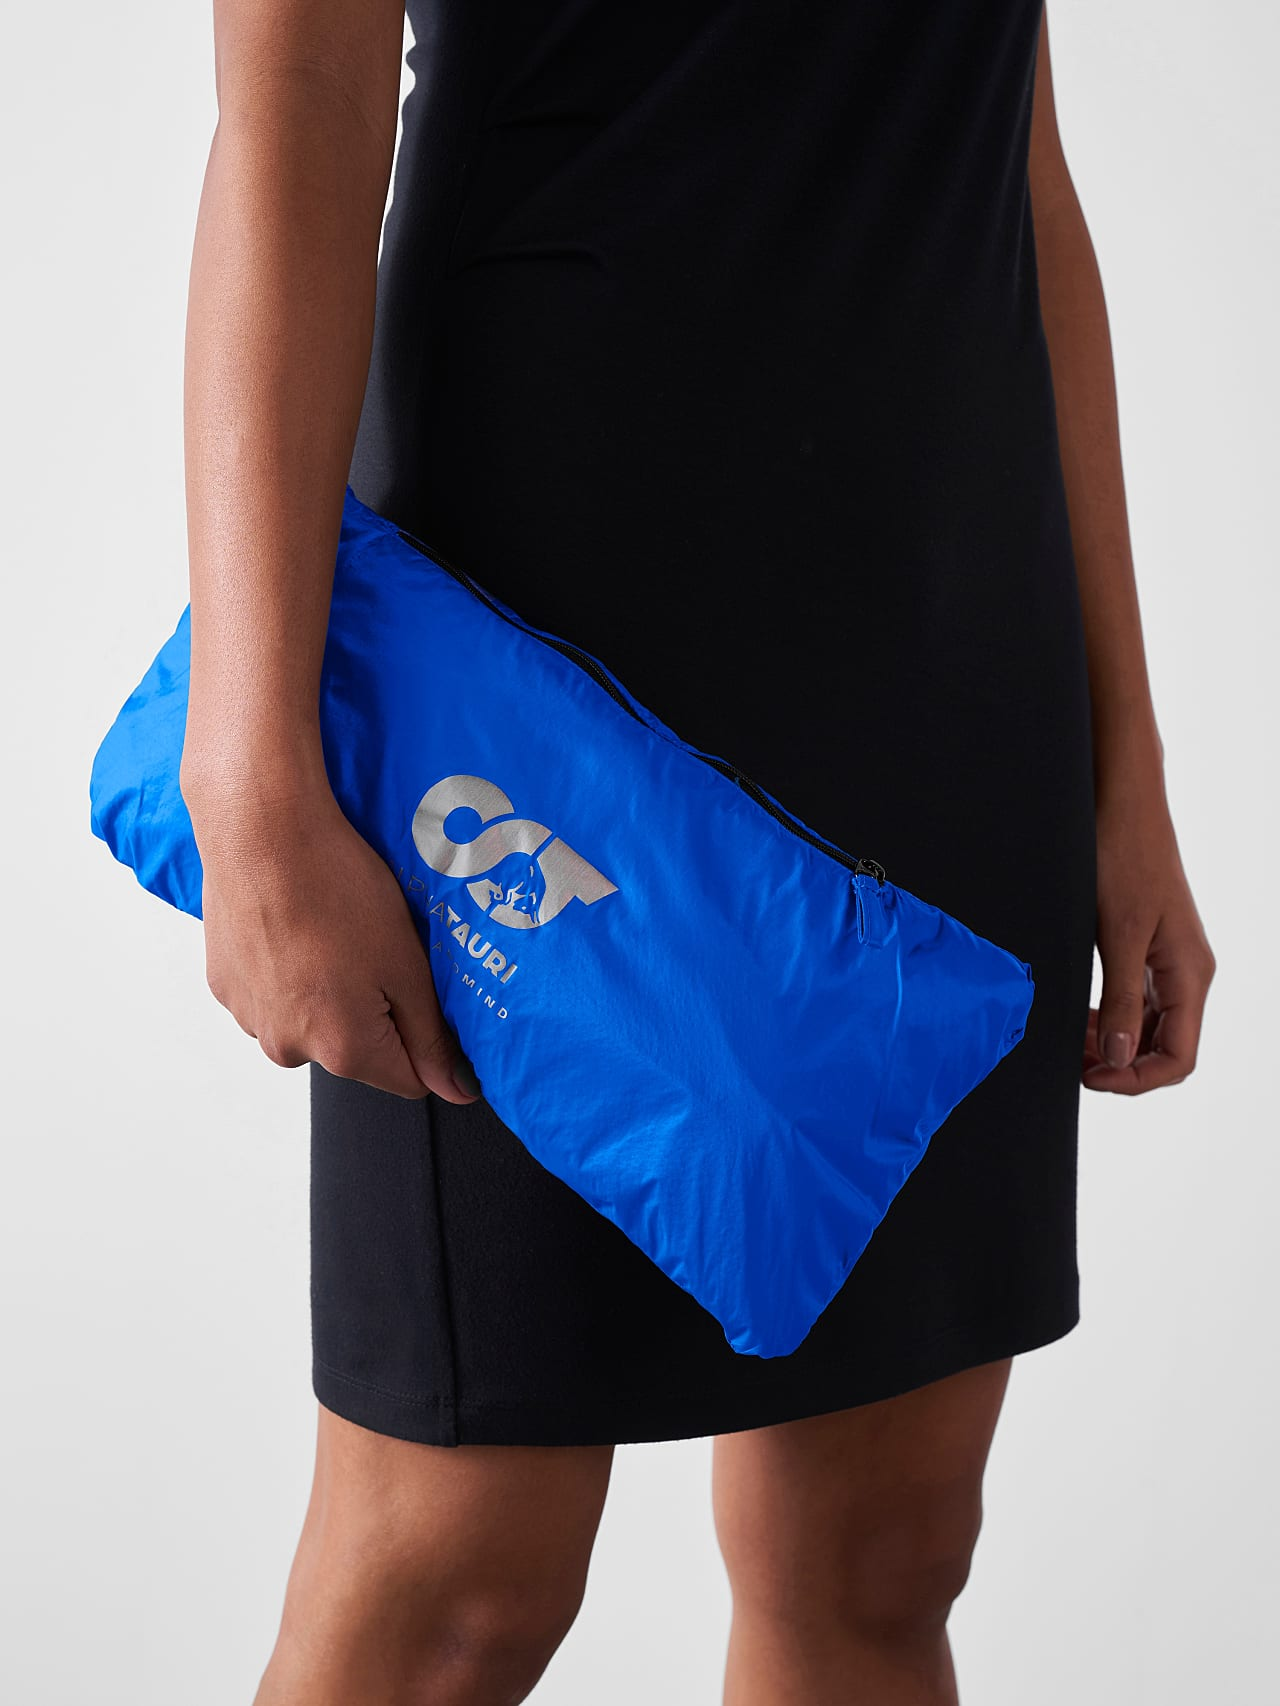 OLONO V2.Y5.01 Packable Windbreaker Coat blue Extra Alpha Tauri